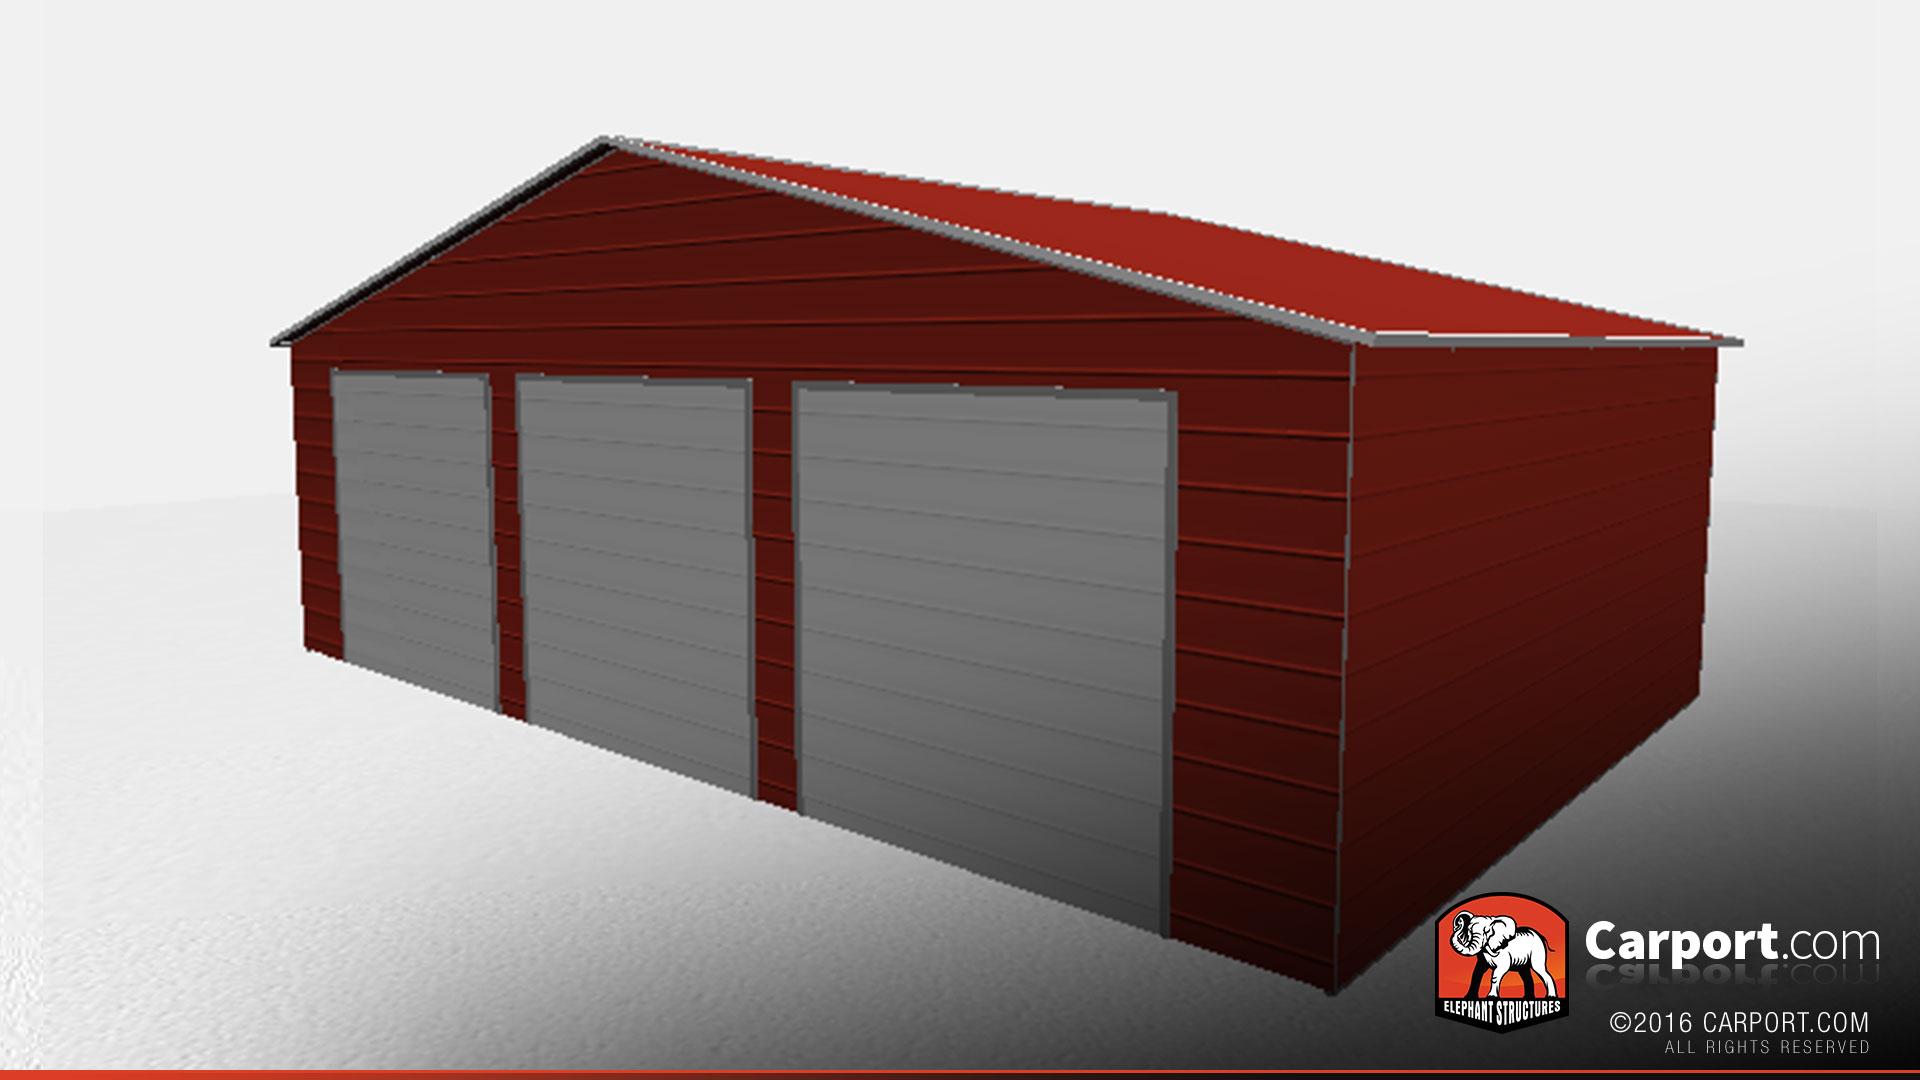 3 Car Garage With Storage 21691dr: Three Car Garage Storage Building With Vertical Roof